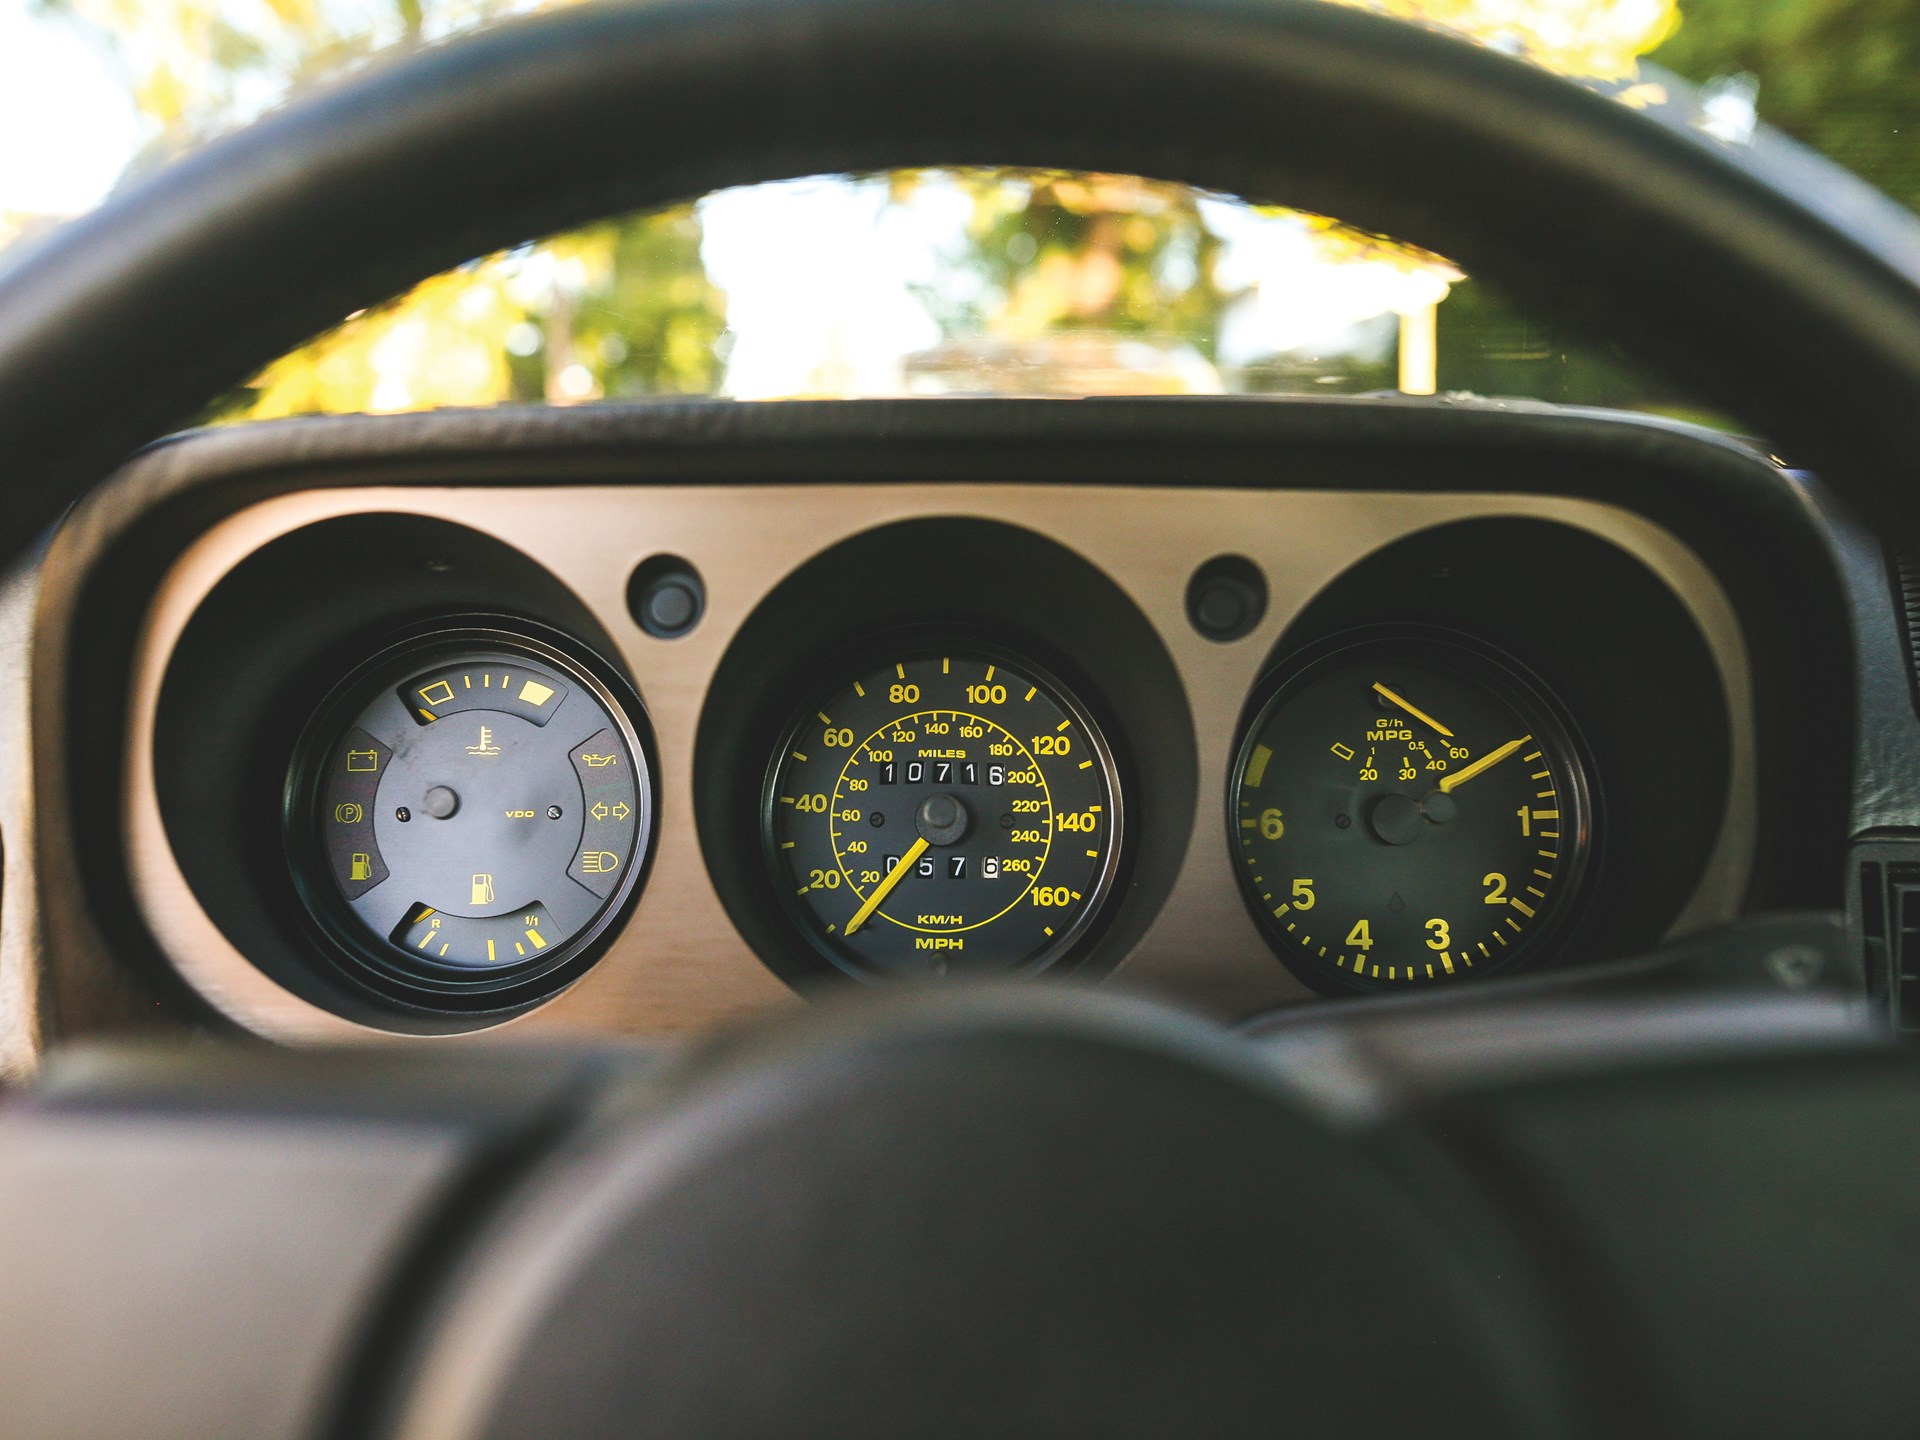 1984 Porsche 944 gauges